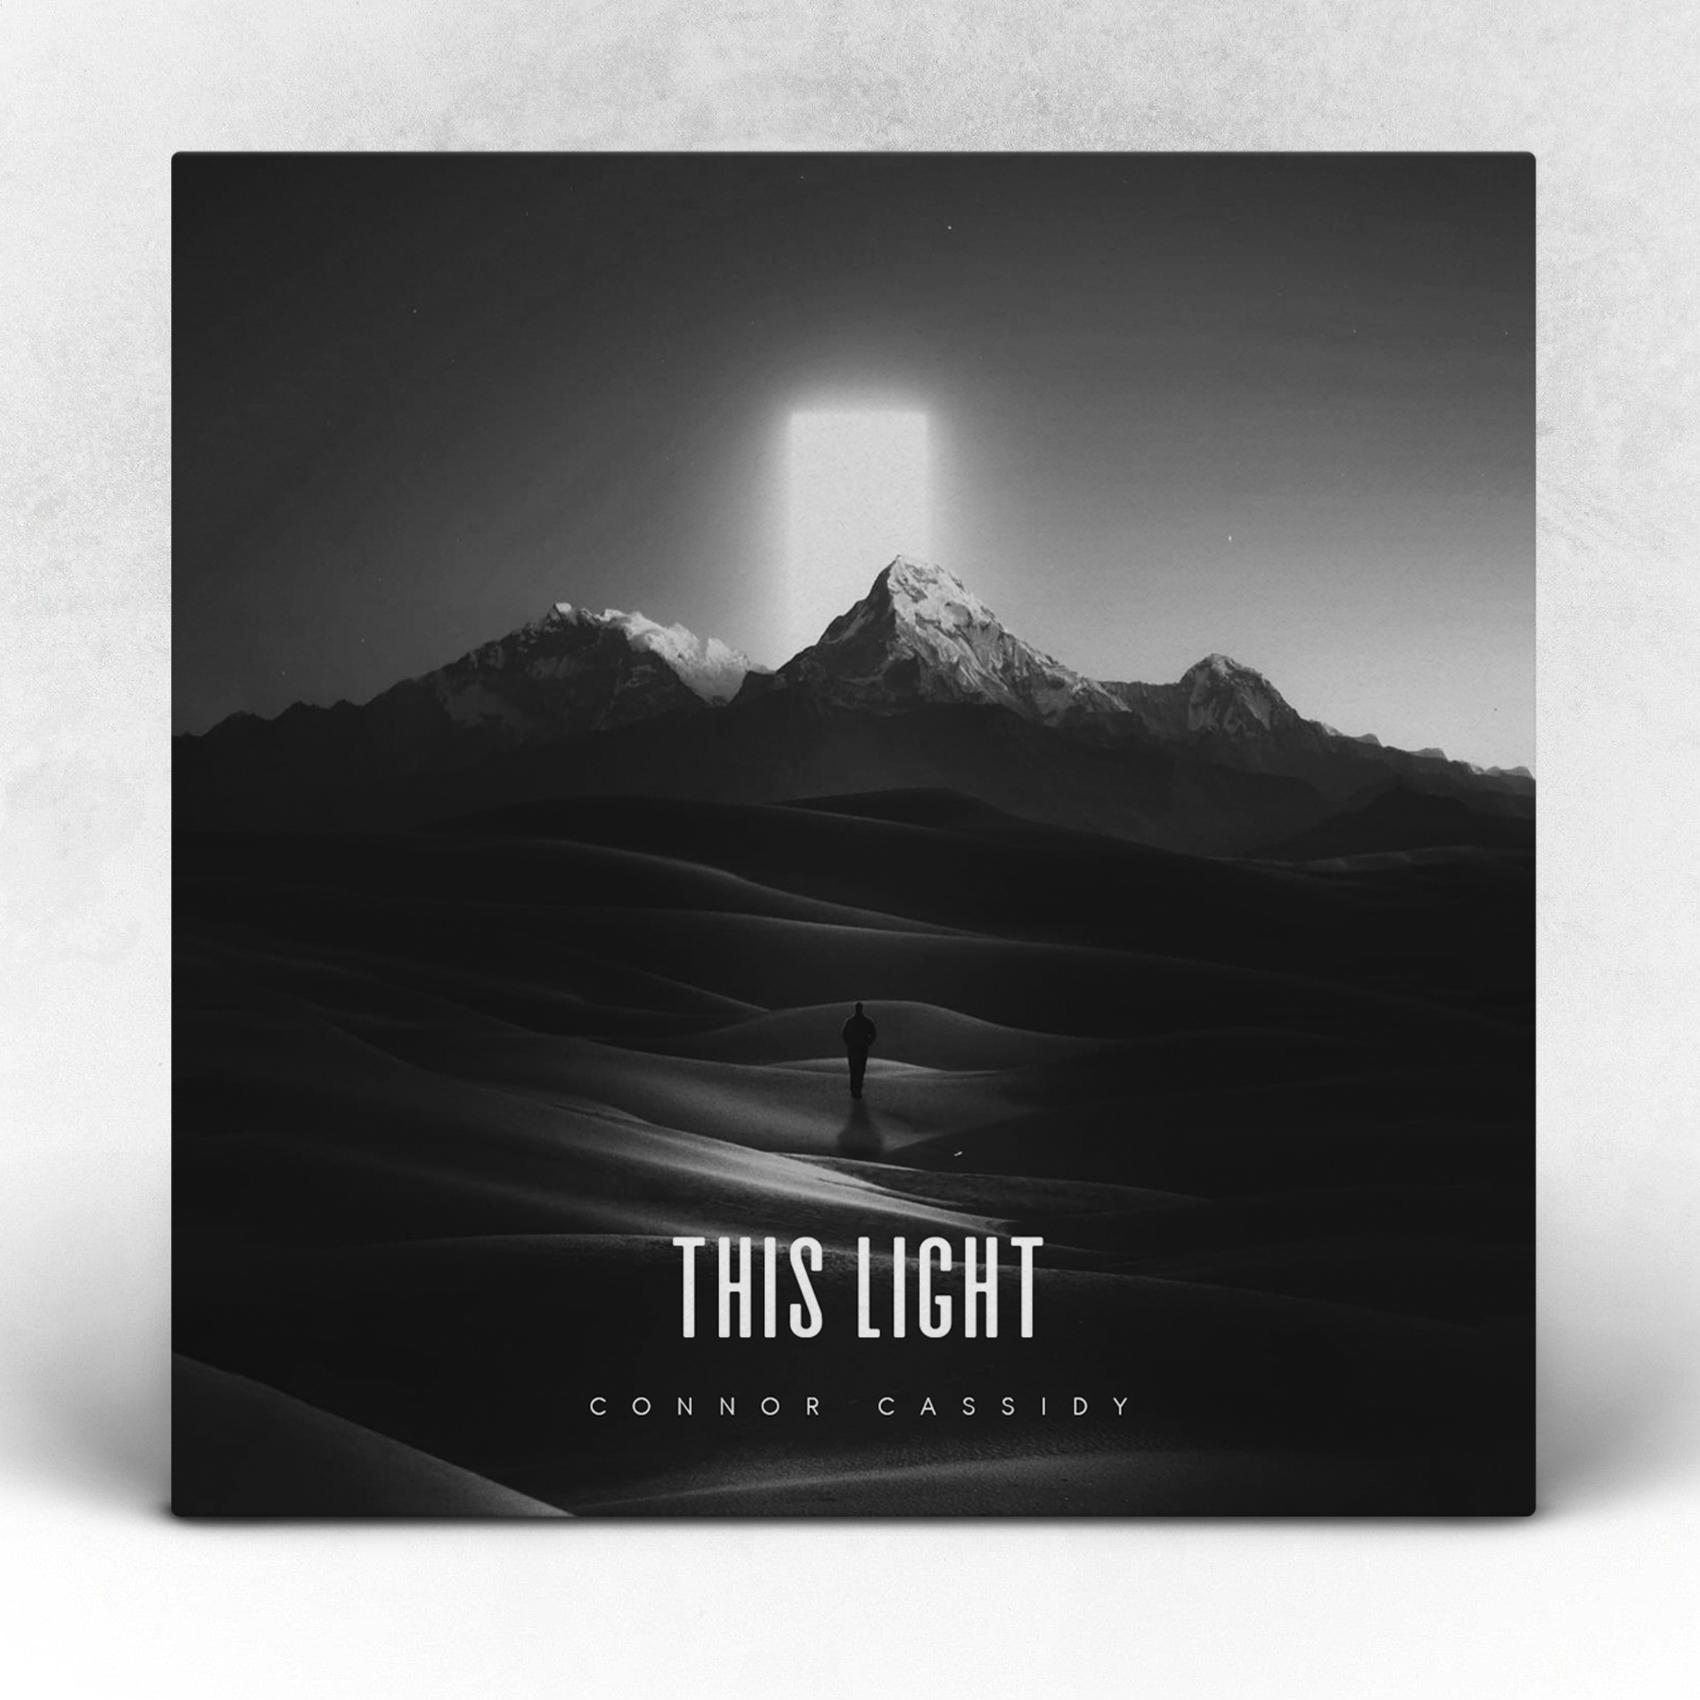 This Light Cover Art copy.jpg